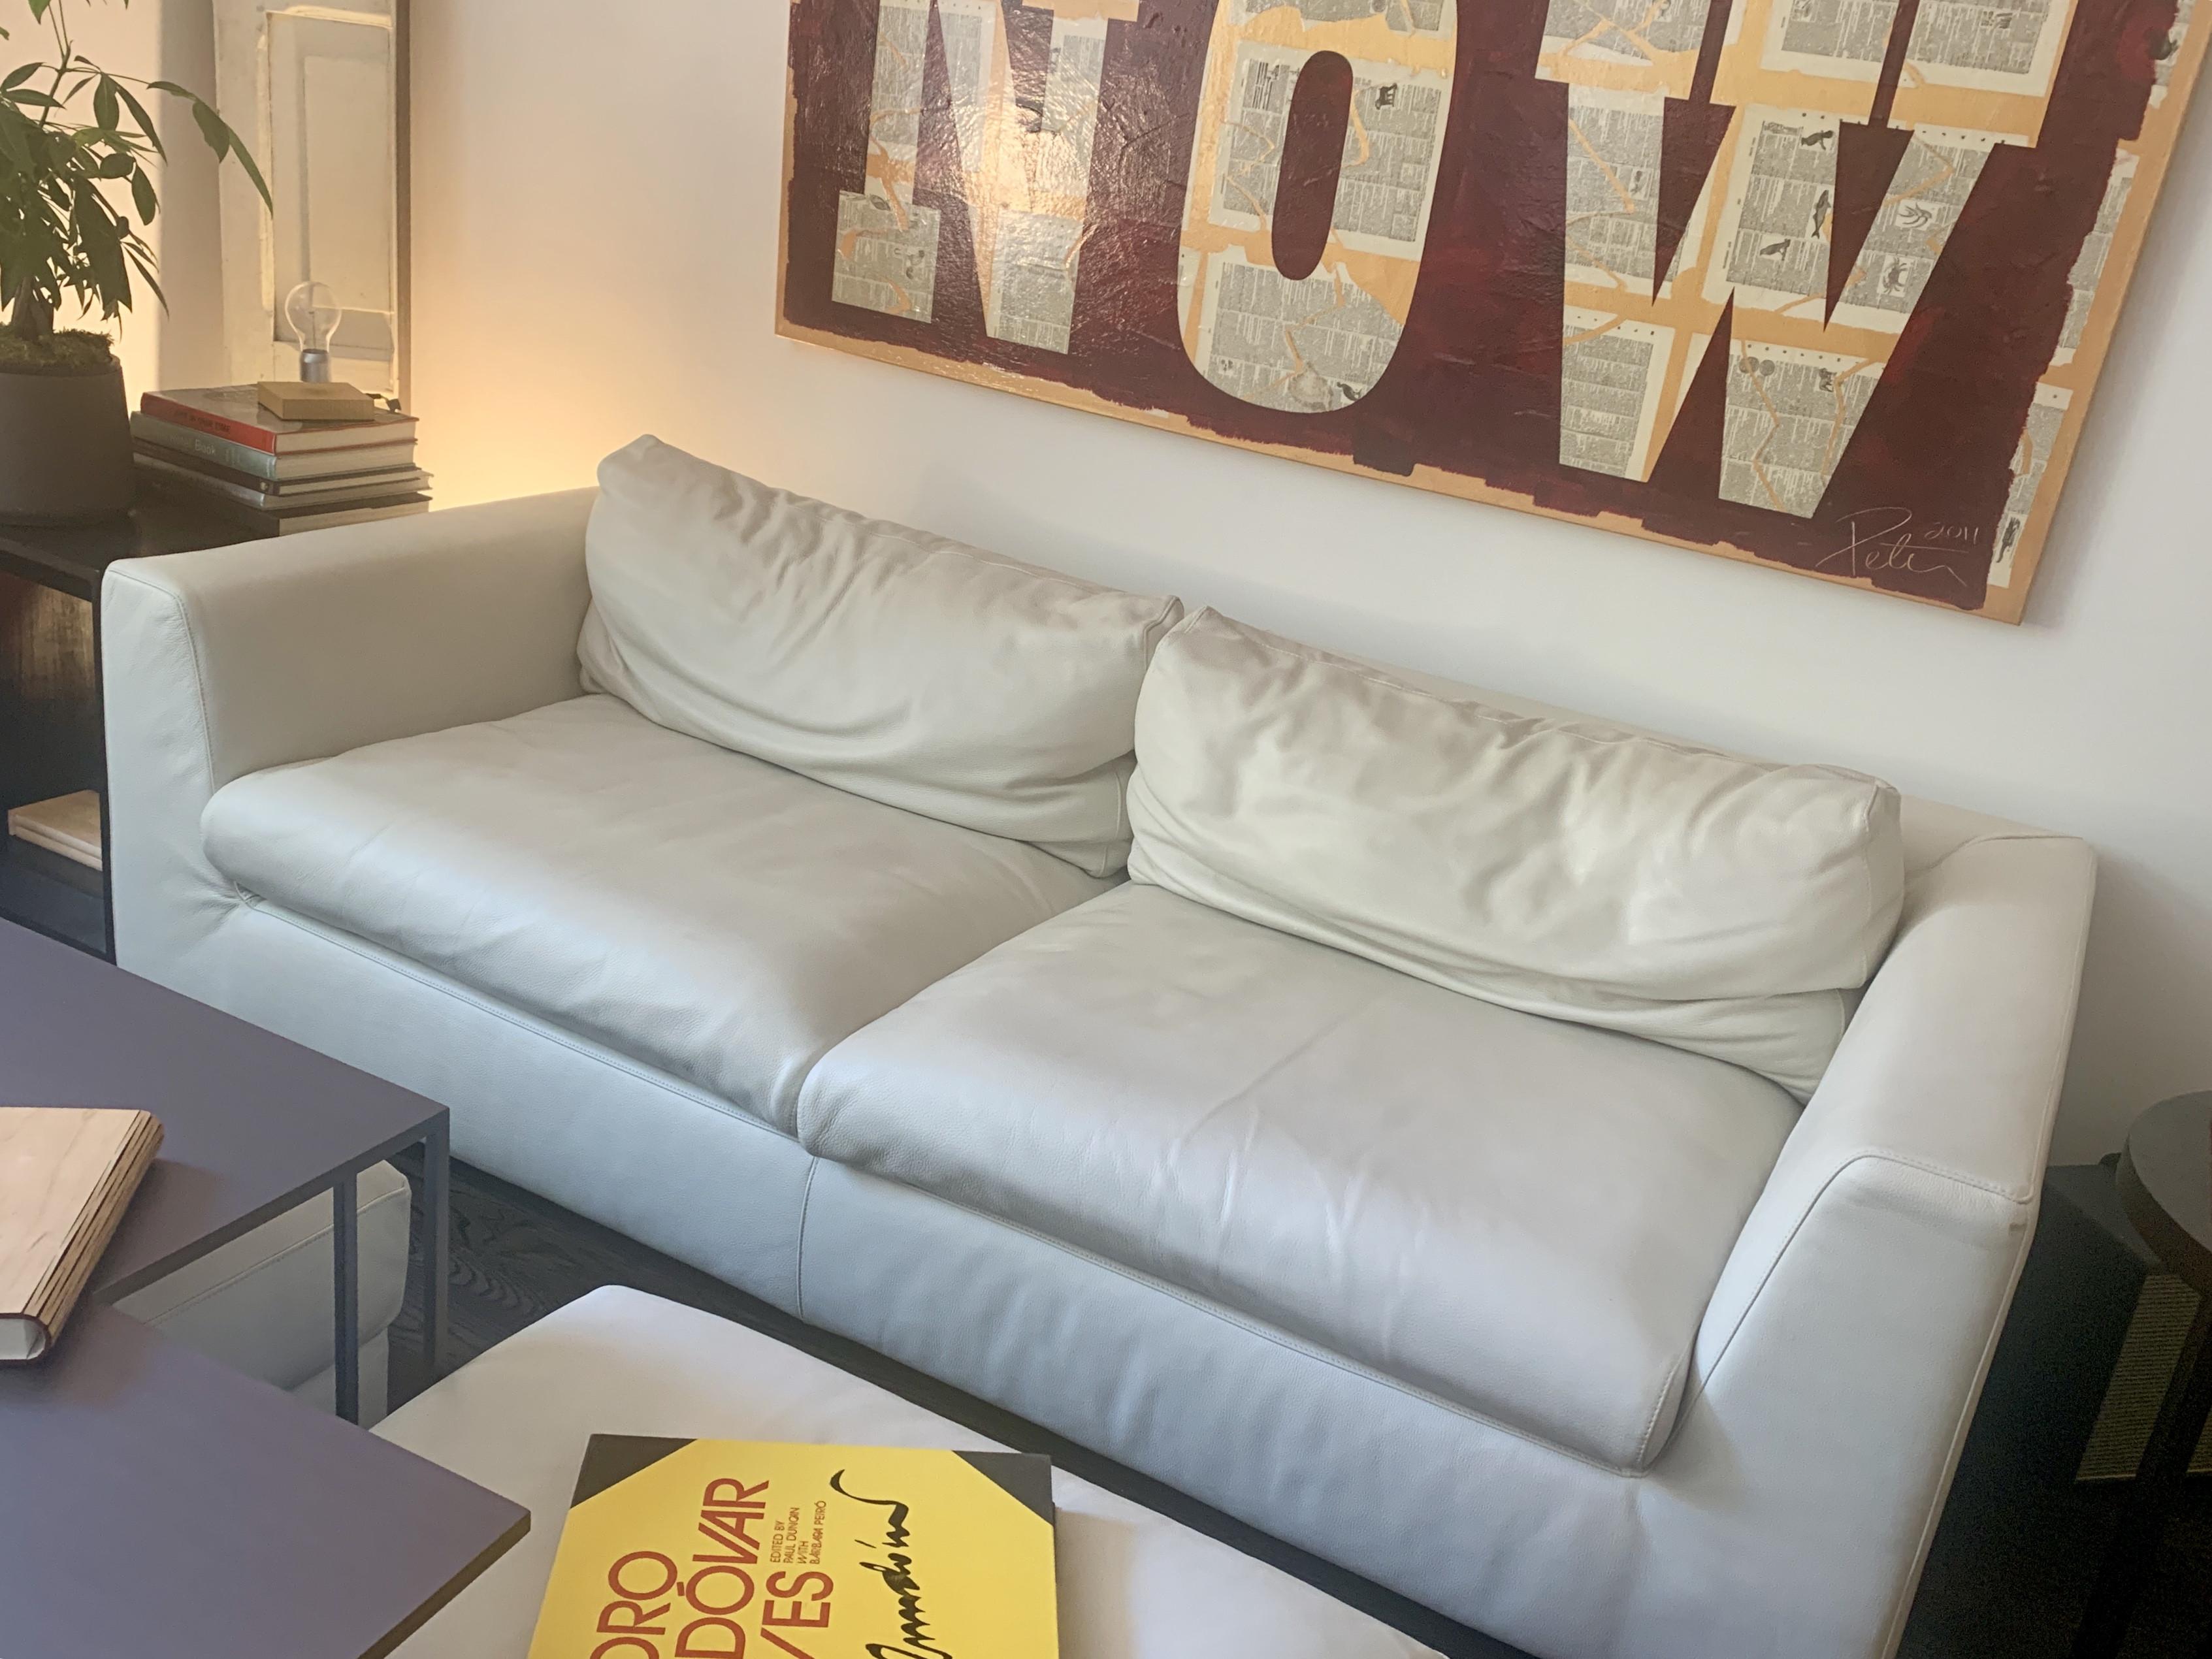 RH Off-White Leather Sofa